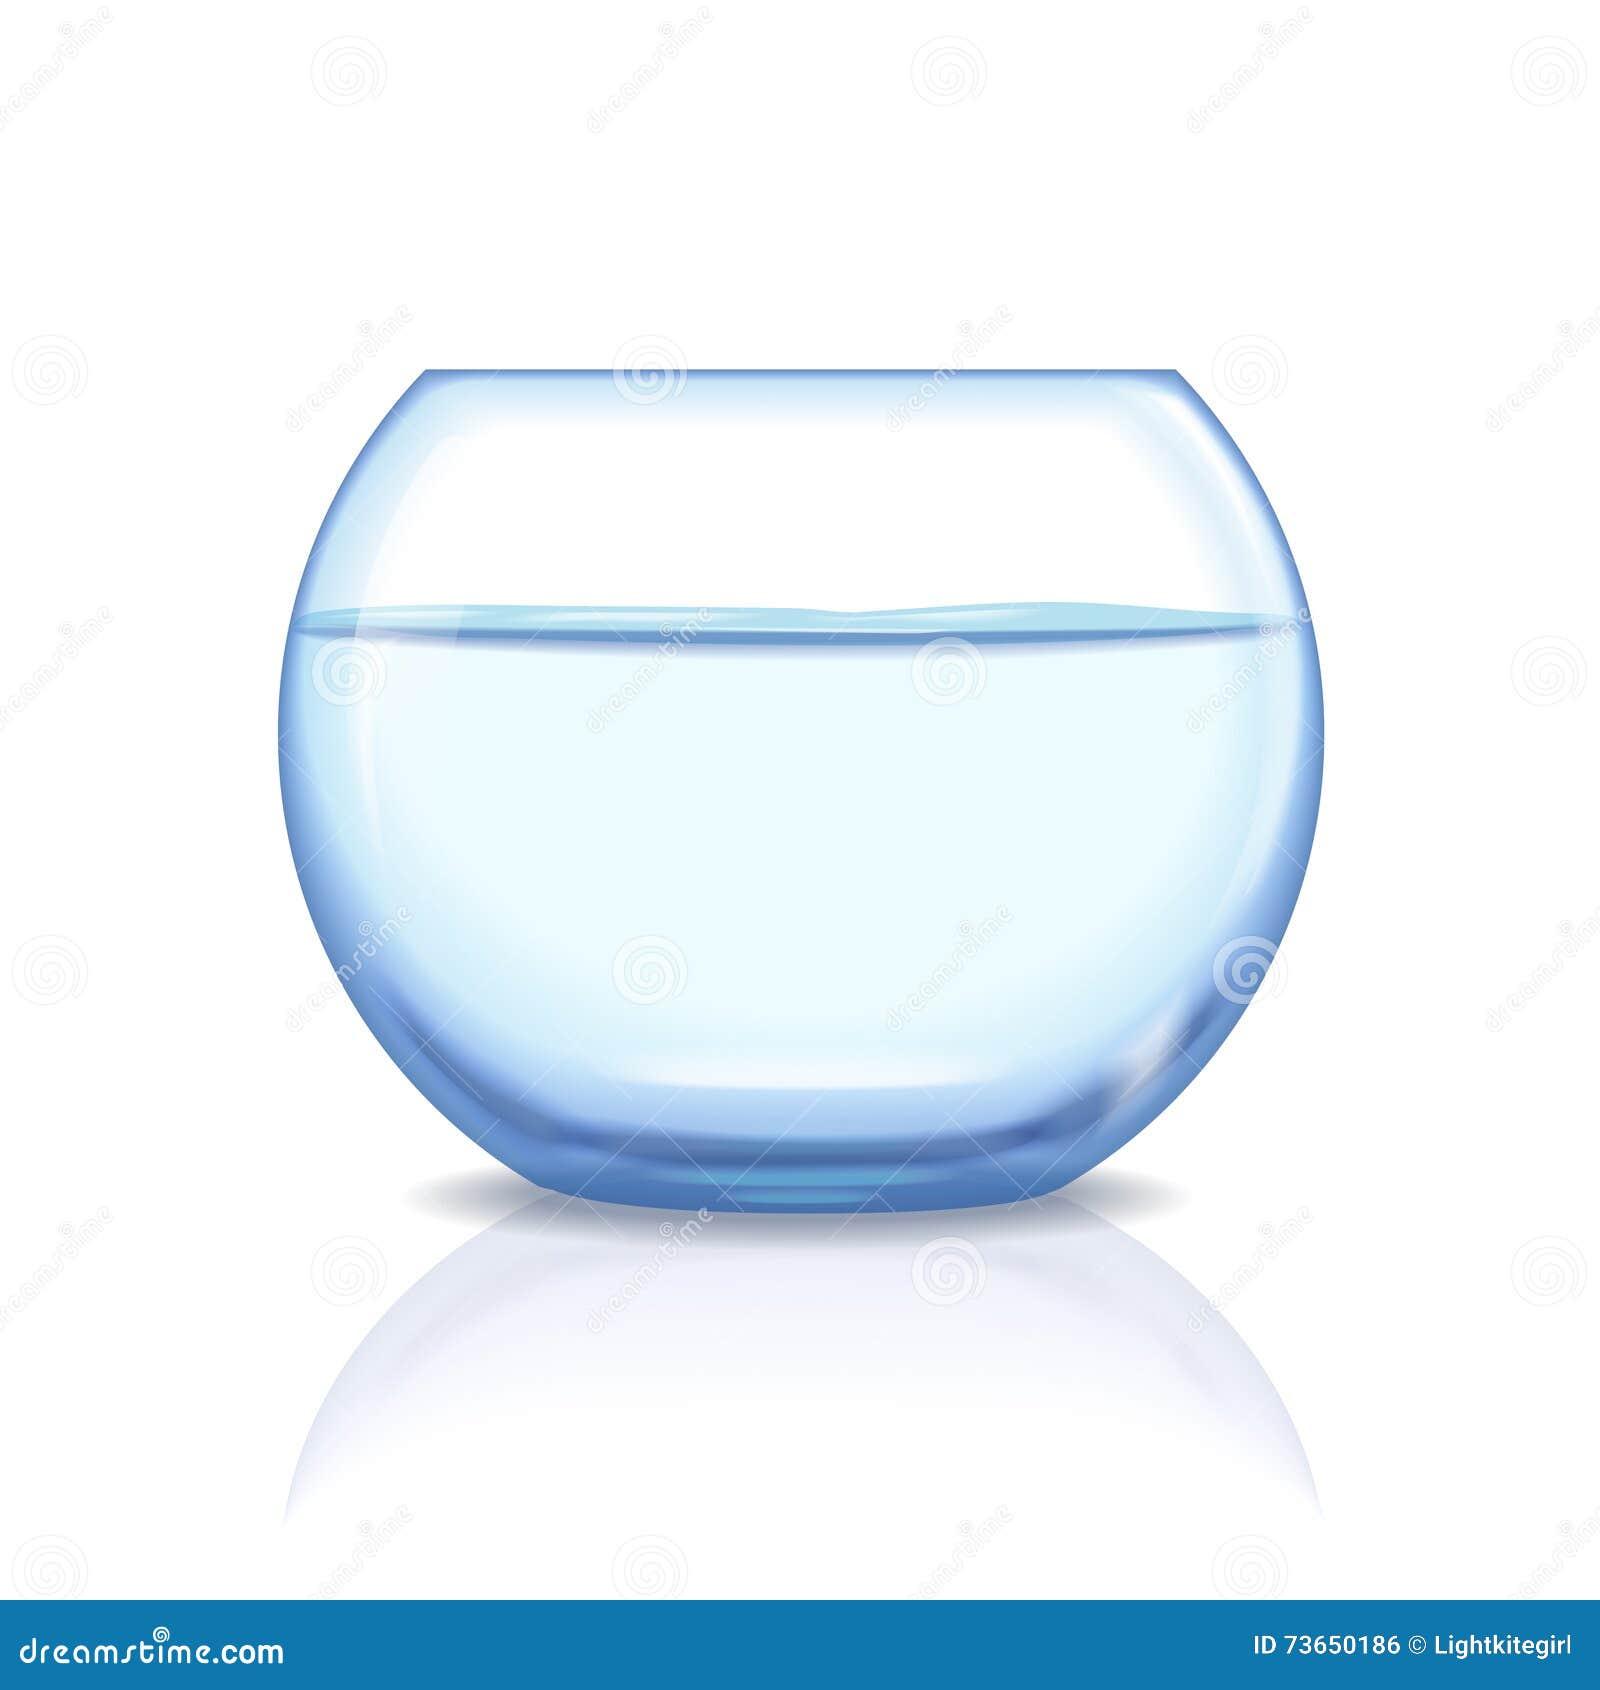 Realistic glass fishbowl aquarium with water on for Bocal aquarium original